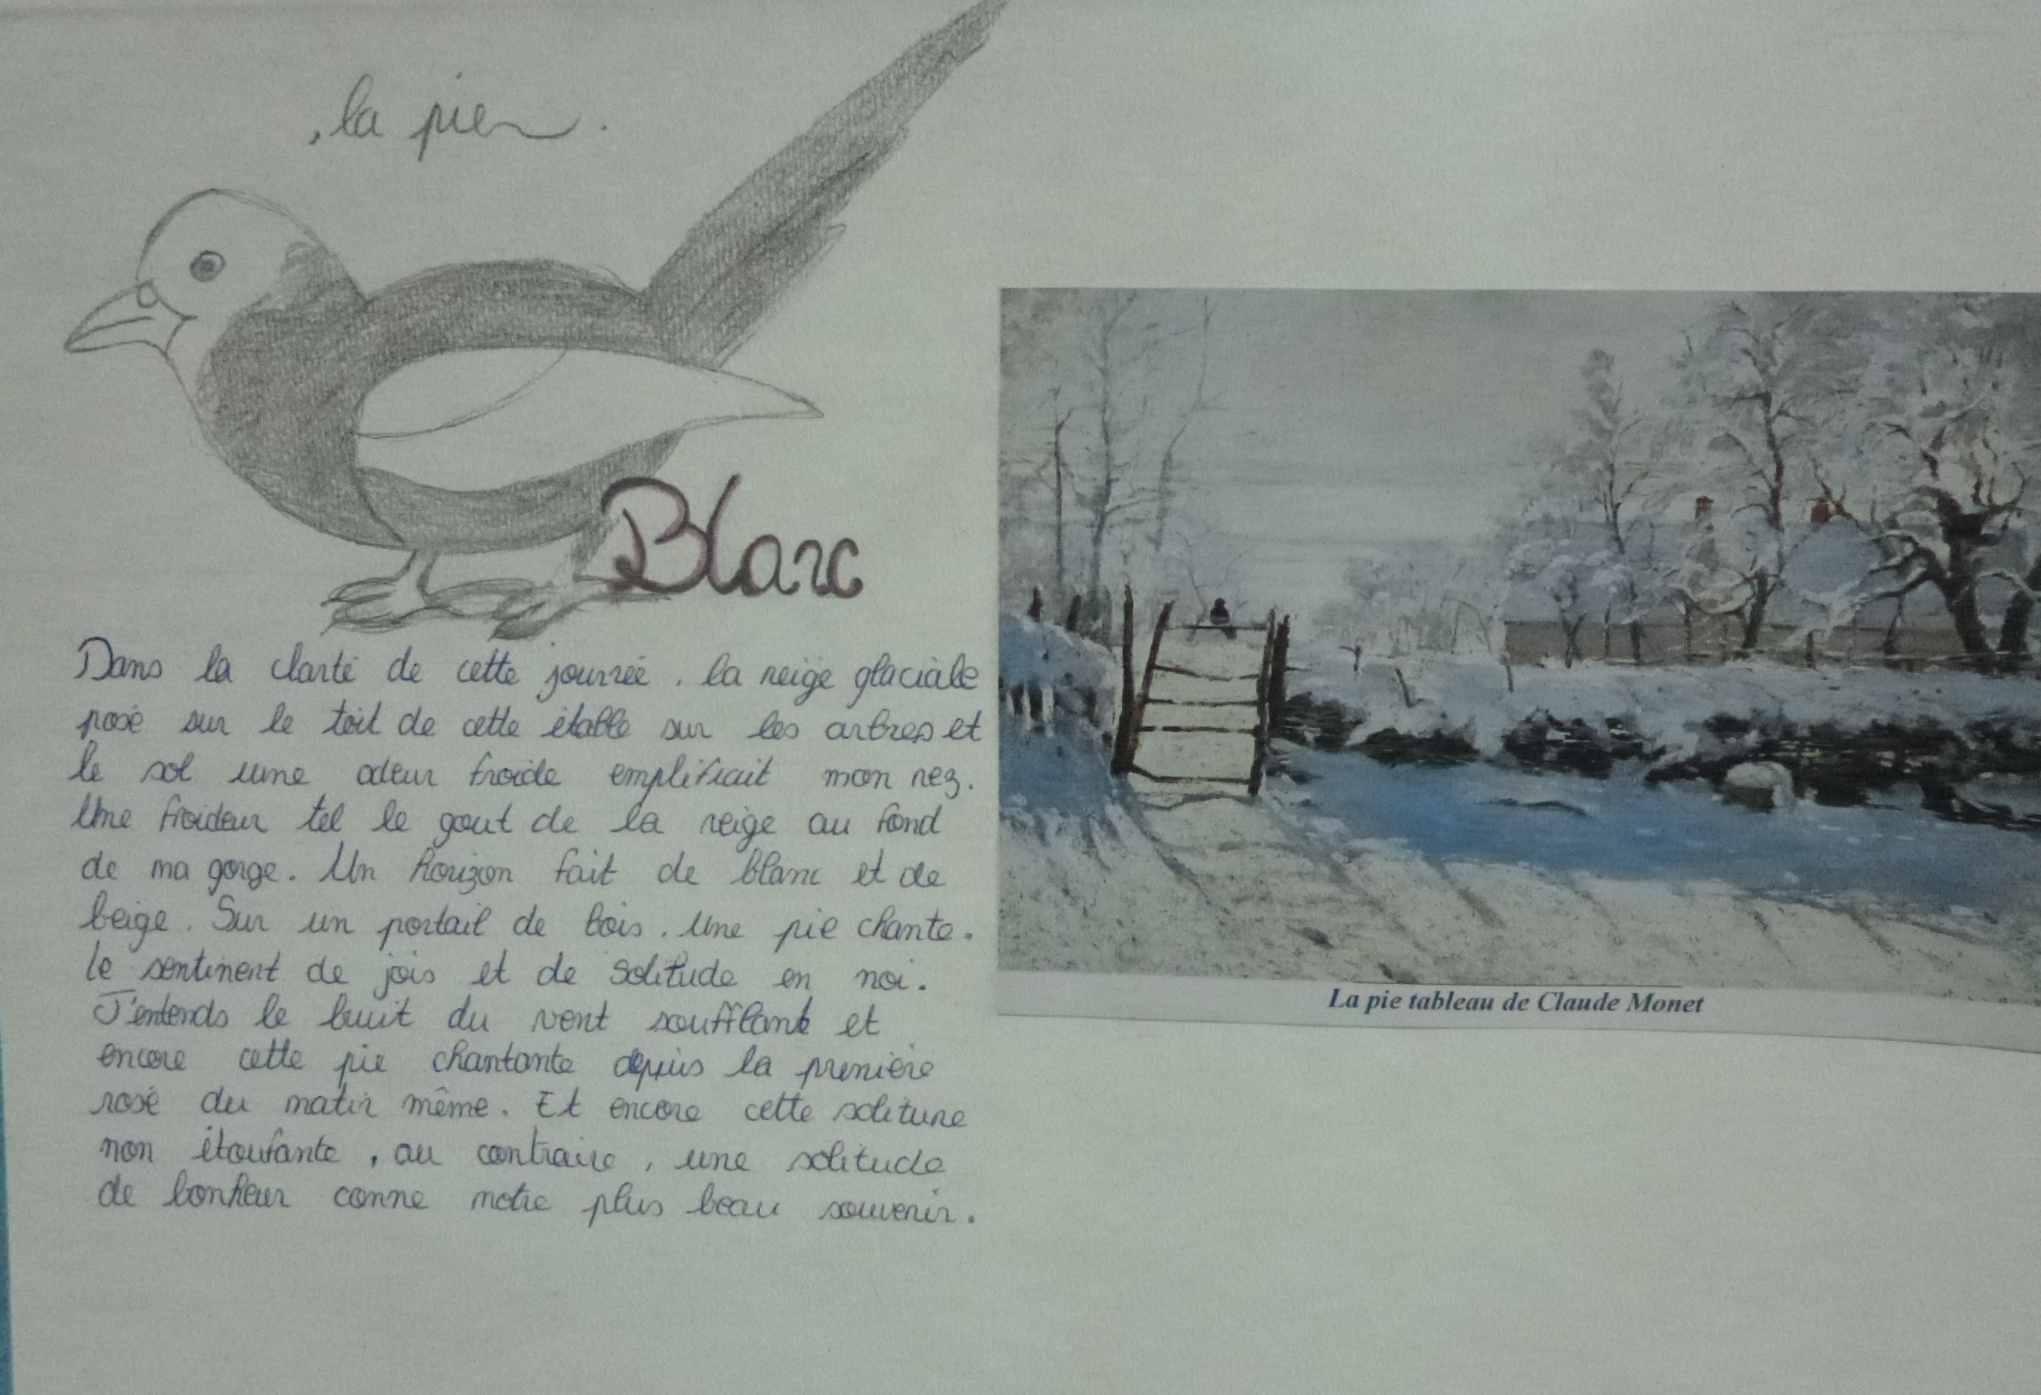 Exposition Autour Dun Recueil De Posie Collge Amand